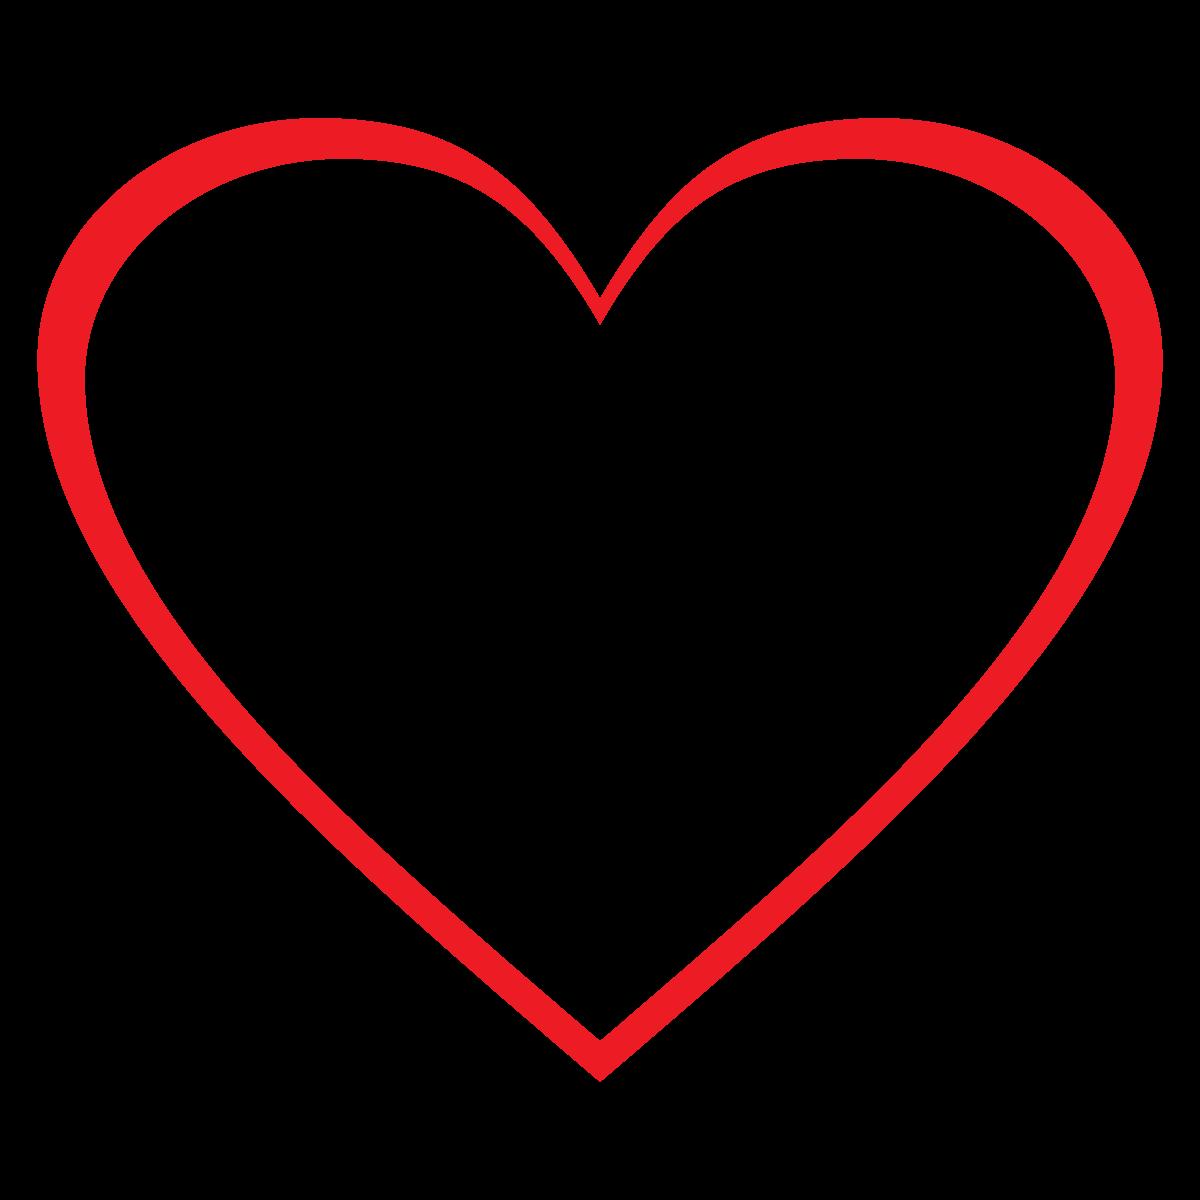 Heart clipart free clip art of hearts clipart clipart 2 clipartix.